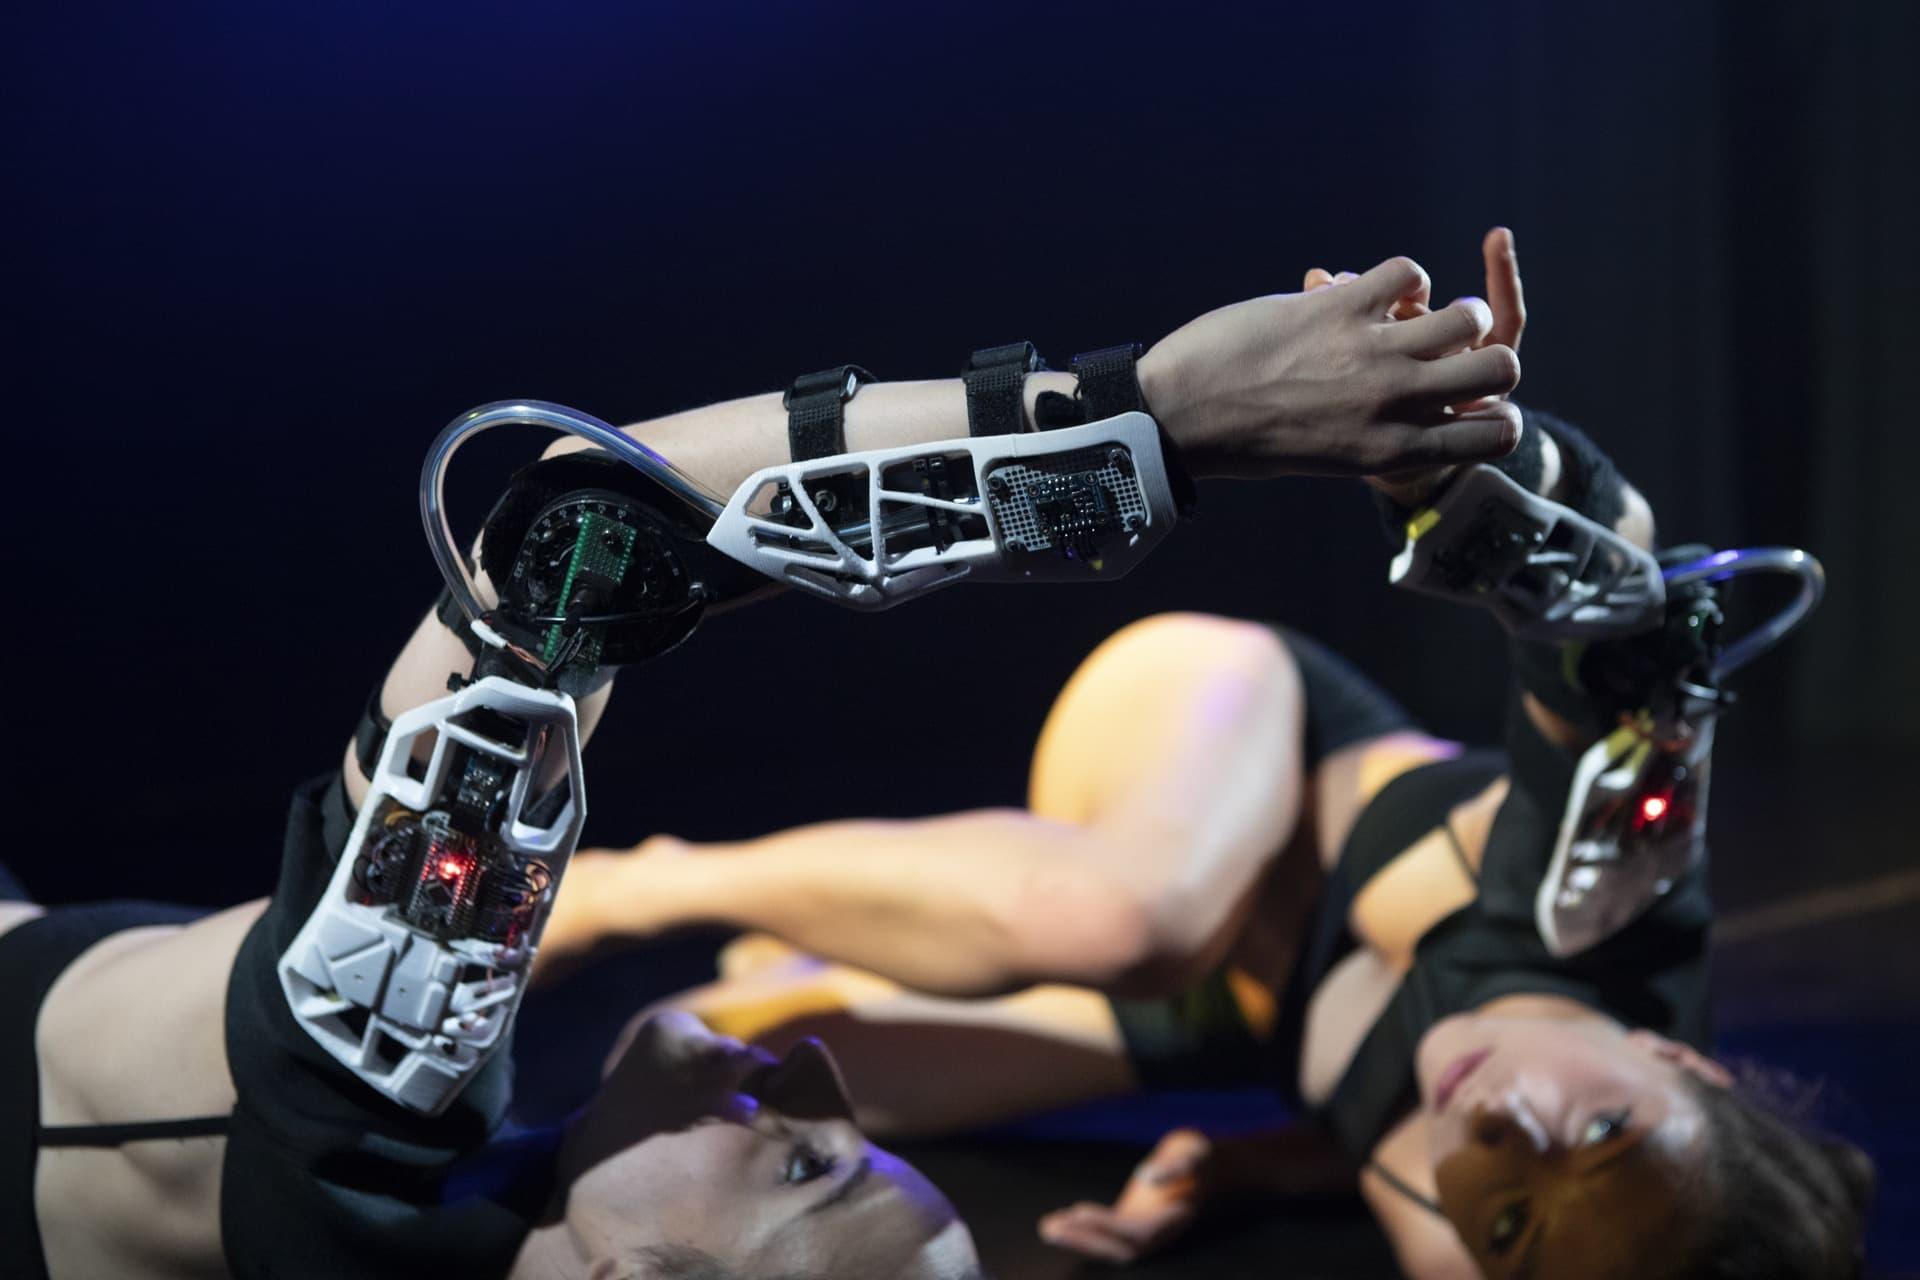 STREAM: synergy meeting vol.2 | Συνάντηση σύγχρονου χορού, μουσικής, και τεχνολογίας, μέσω αυτοσχεδιασμού